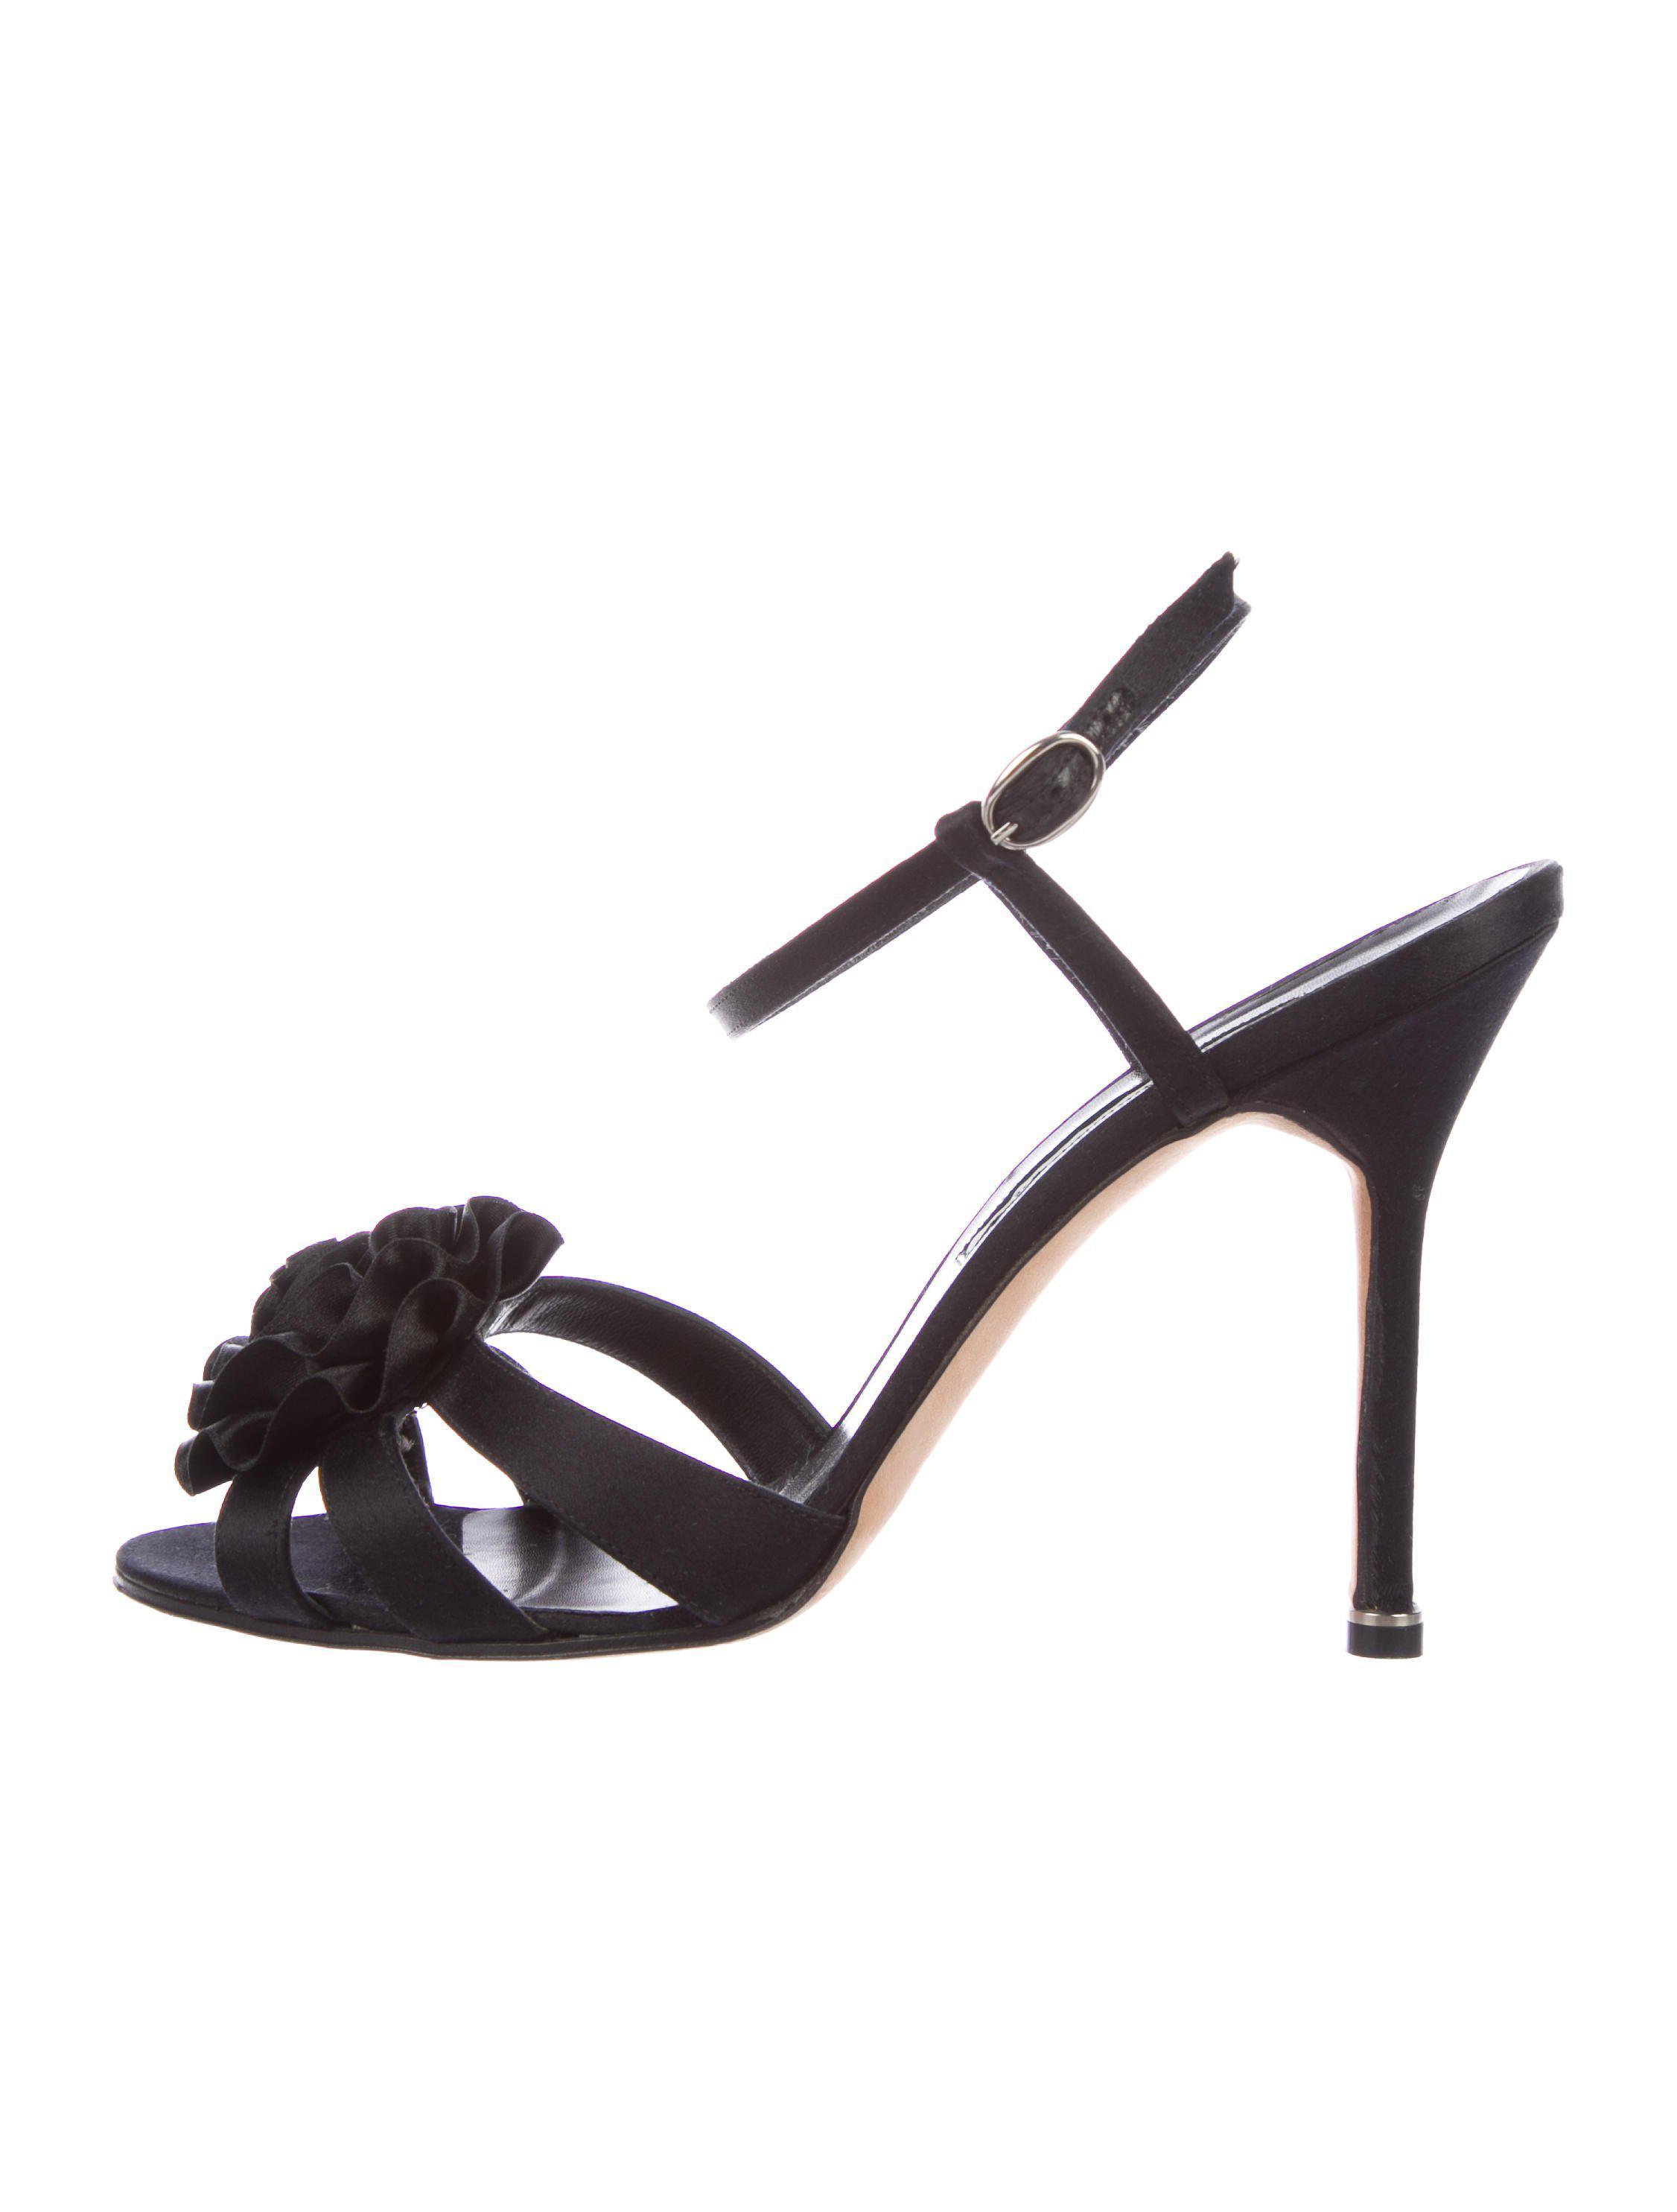 Manolo Blahnik Satin Multistrap Sandals discount genuine cheap Manchester sale shop zoIiEt